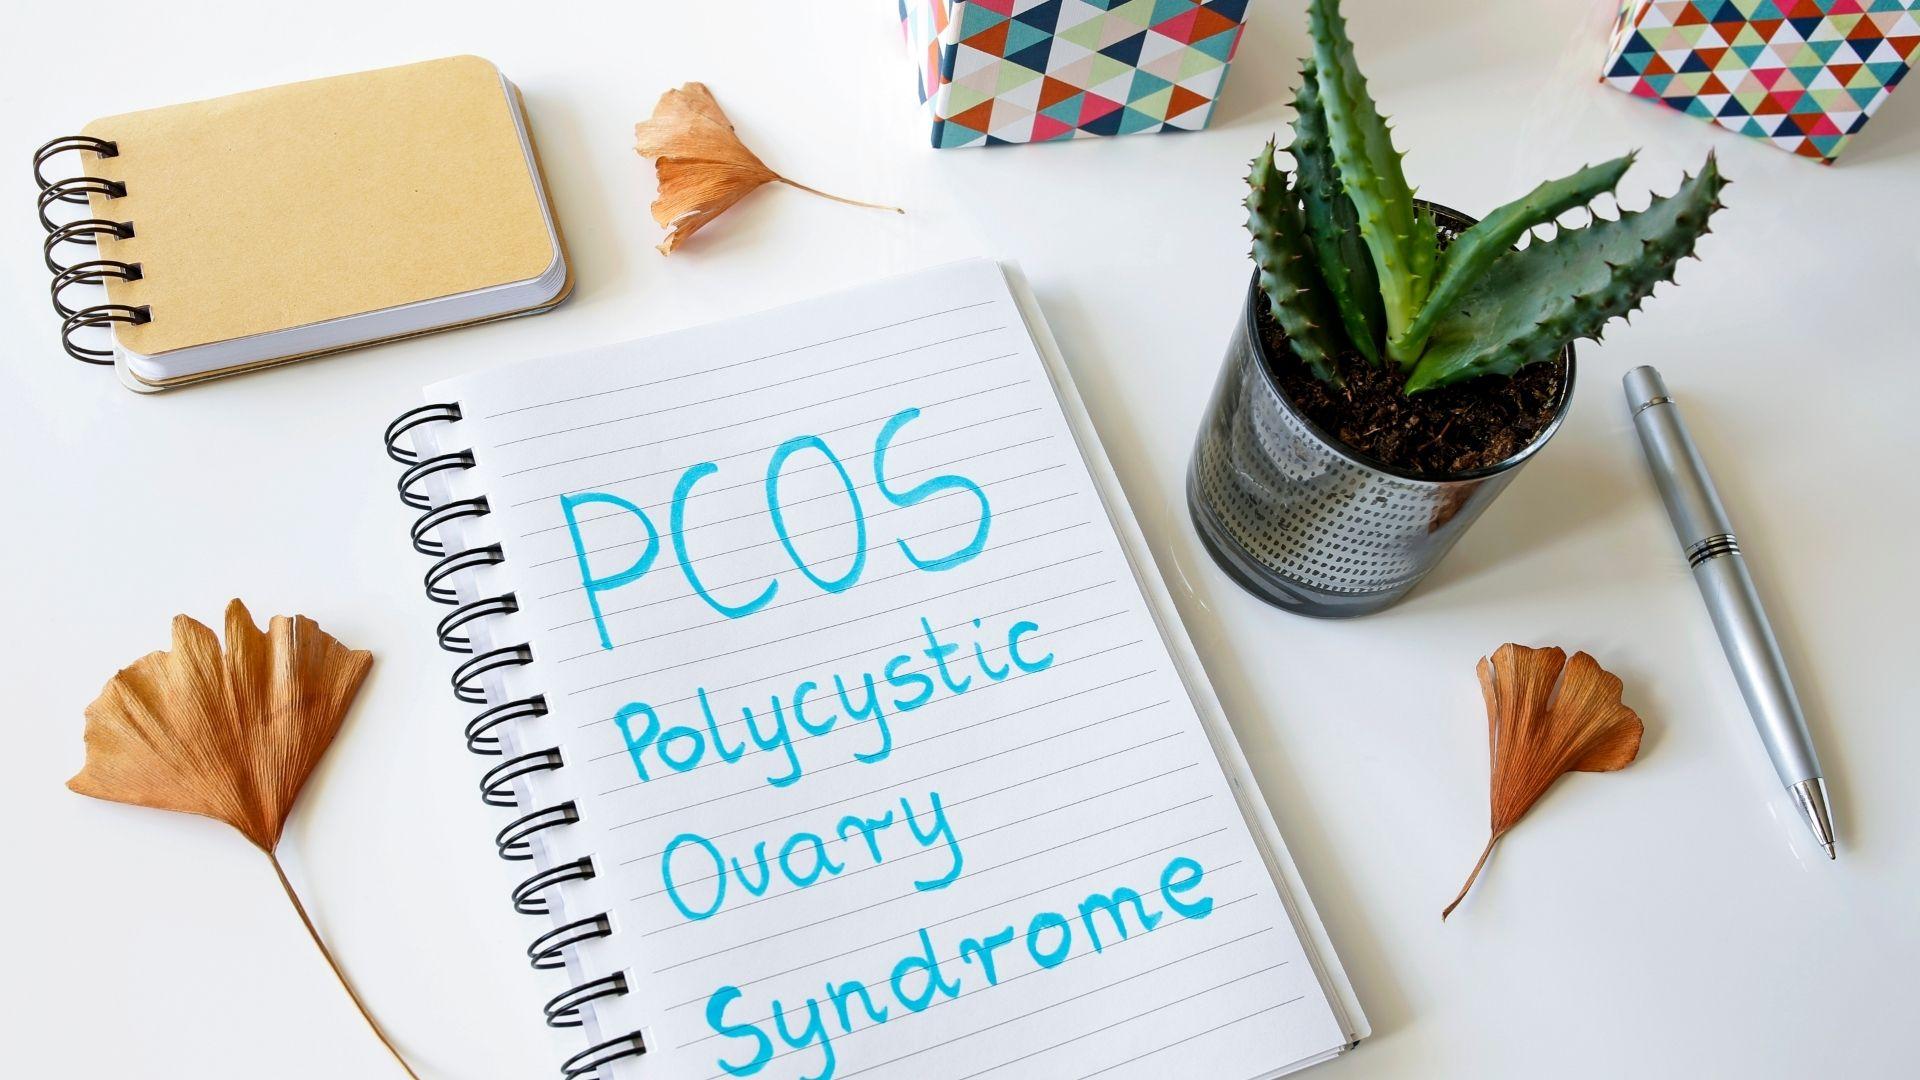 Síndrome do Ovário Poliquístico